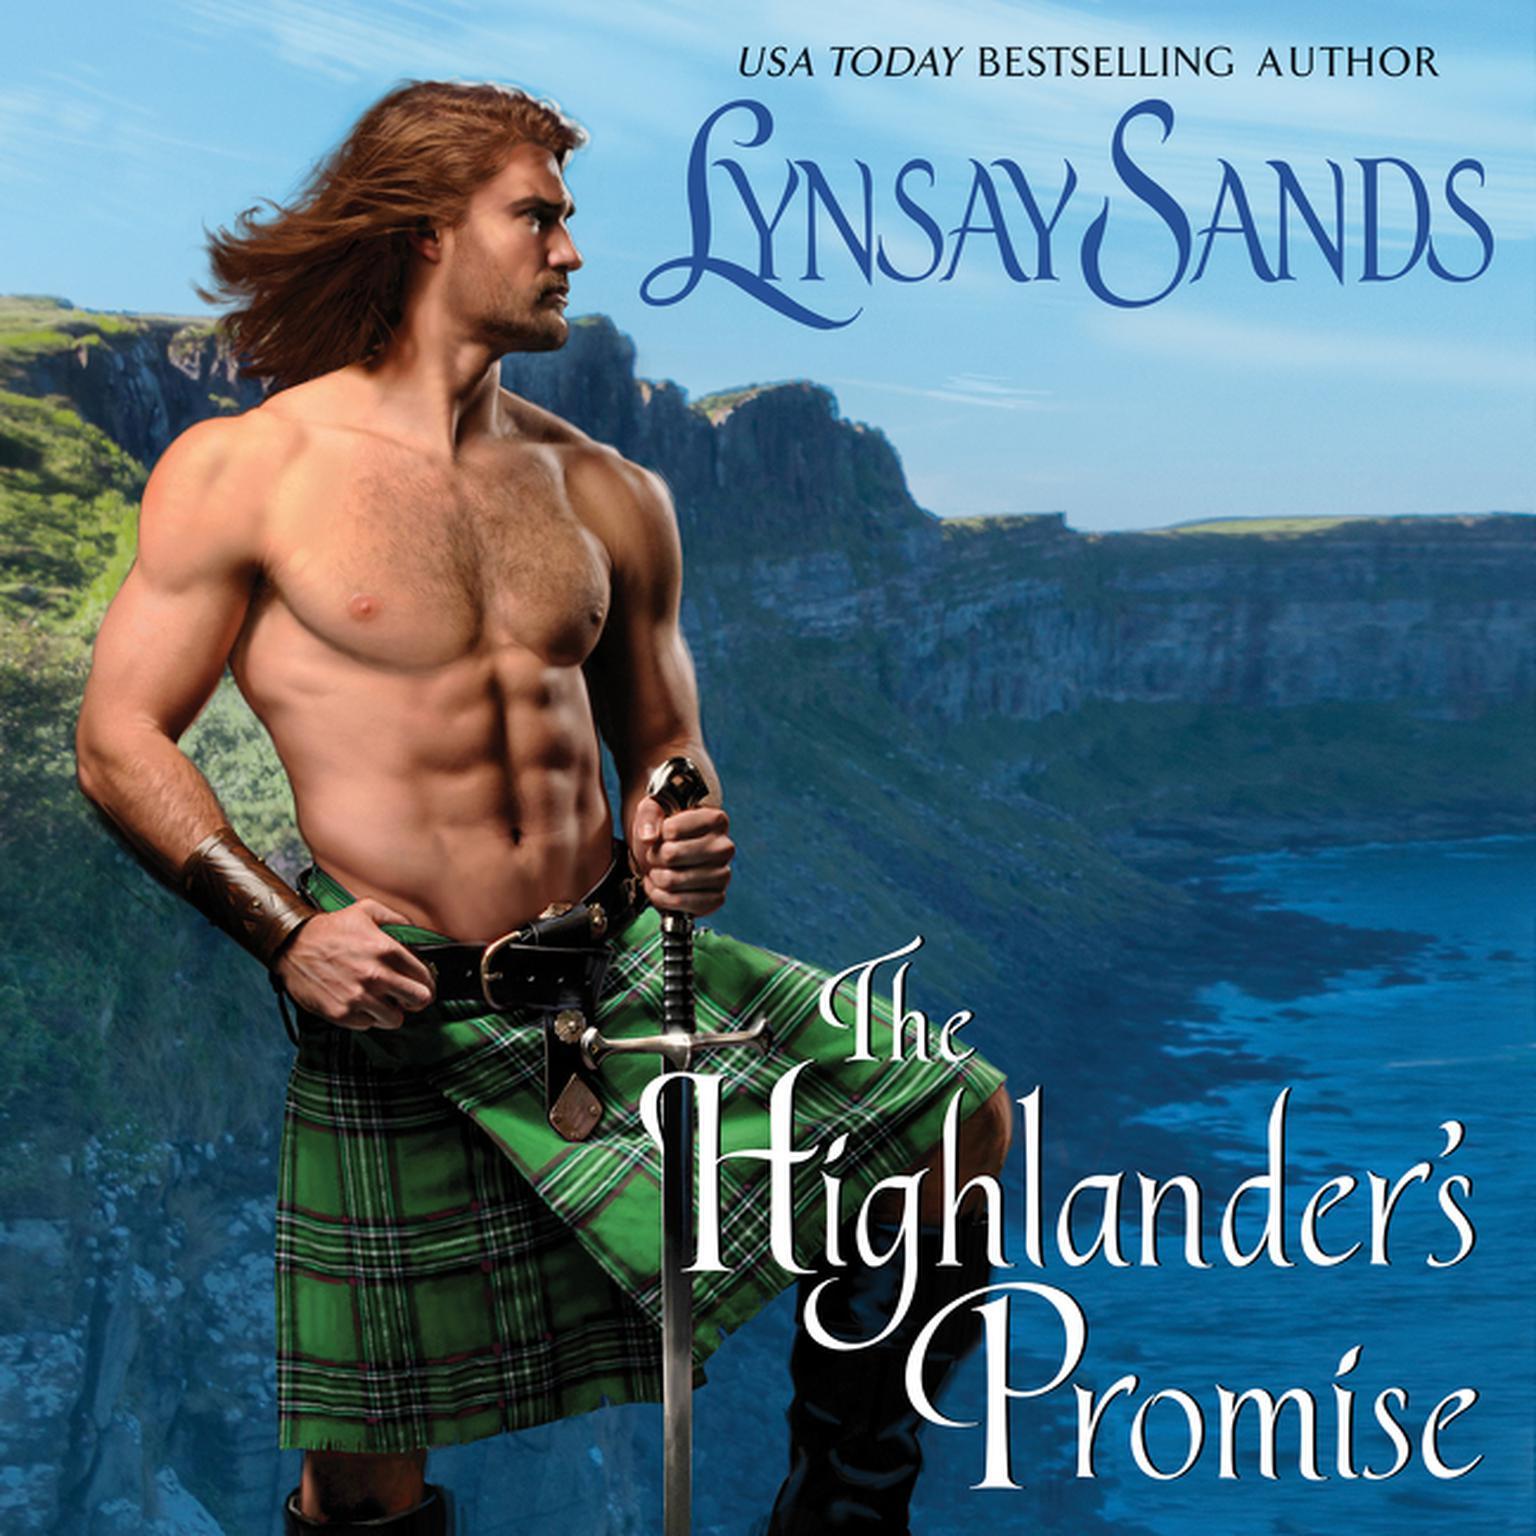 Printable The Highlander's Promise: Higland Brides Audiobook Cover Art